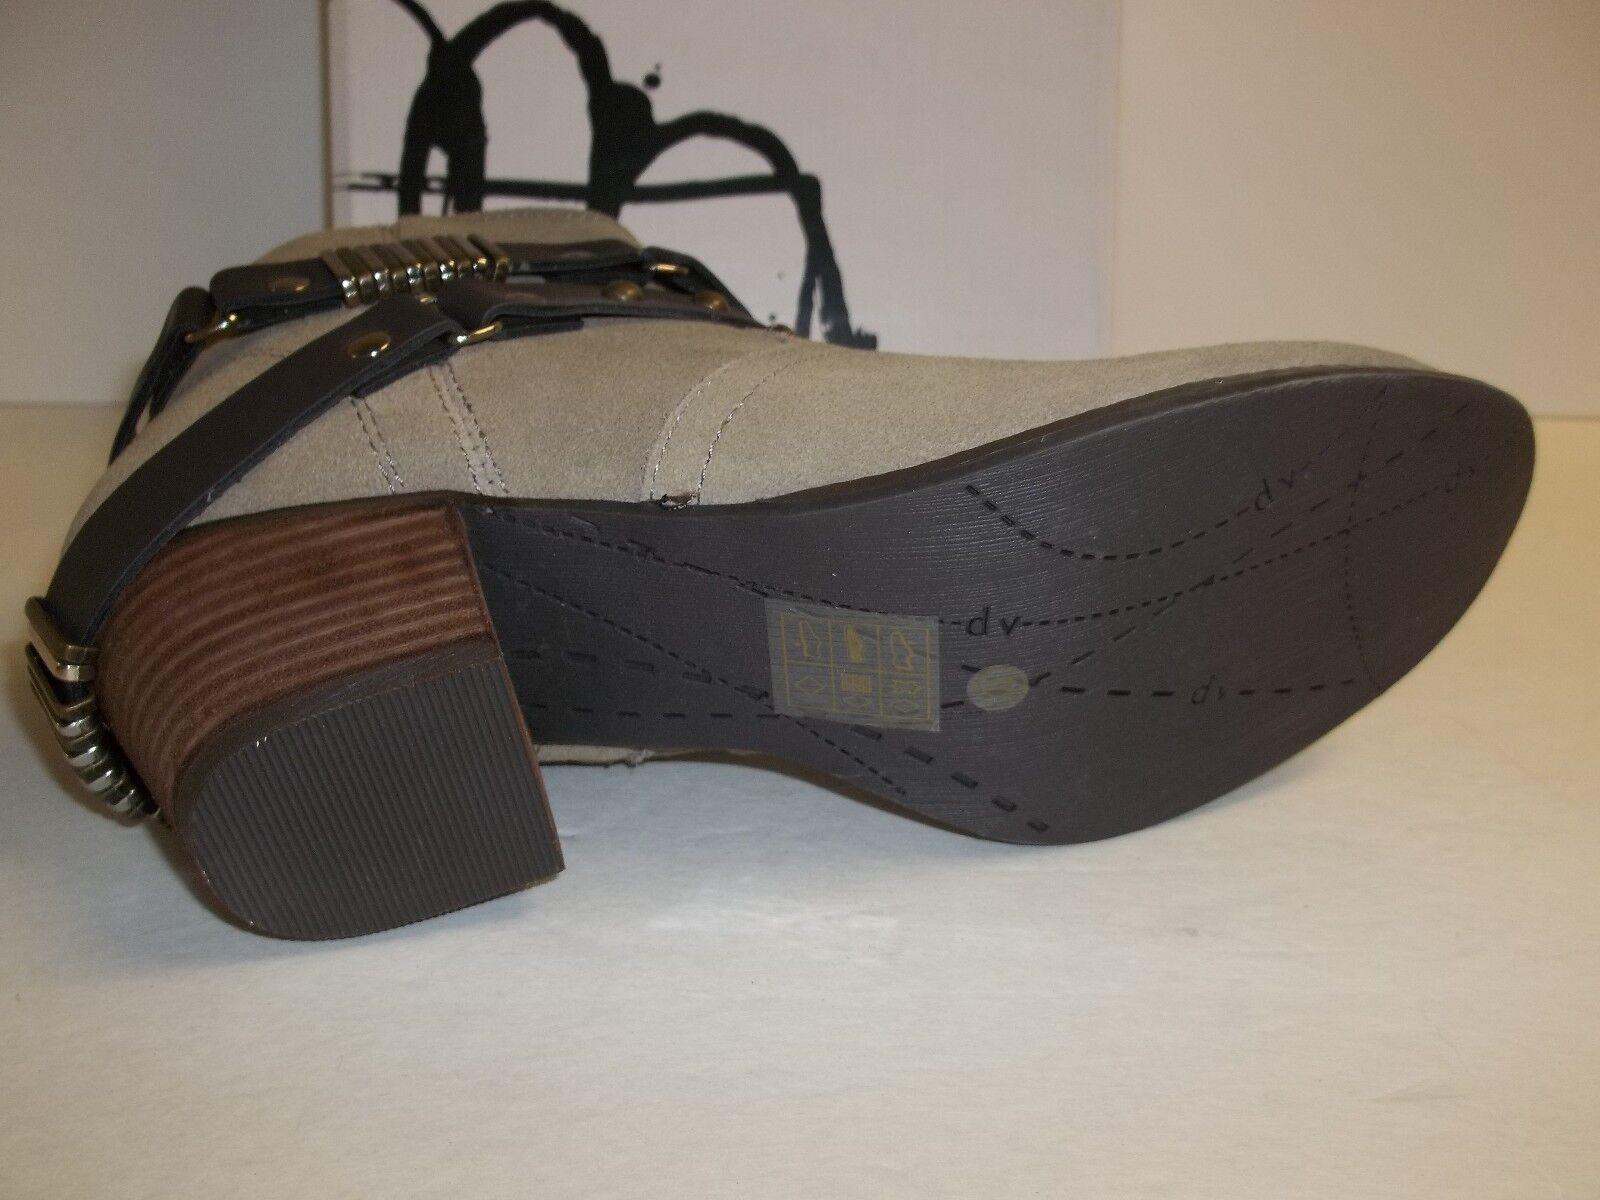 Dolce Vita DV Größe 7 M Jacy Taupe Suede Ankle Stiefel NEU Damenschuhe Schuhes